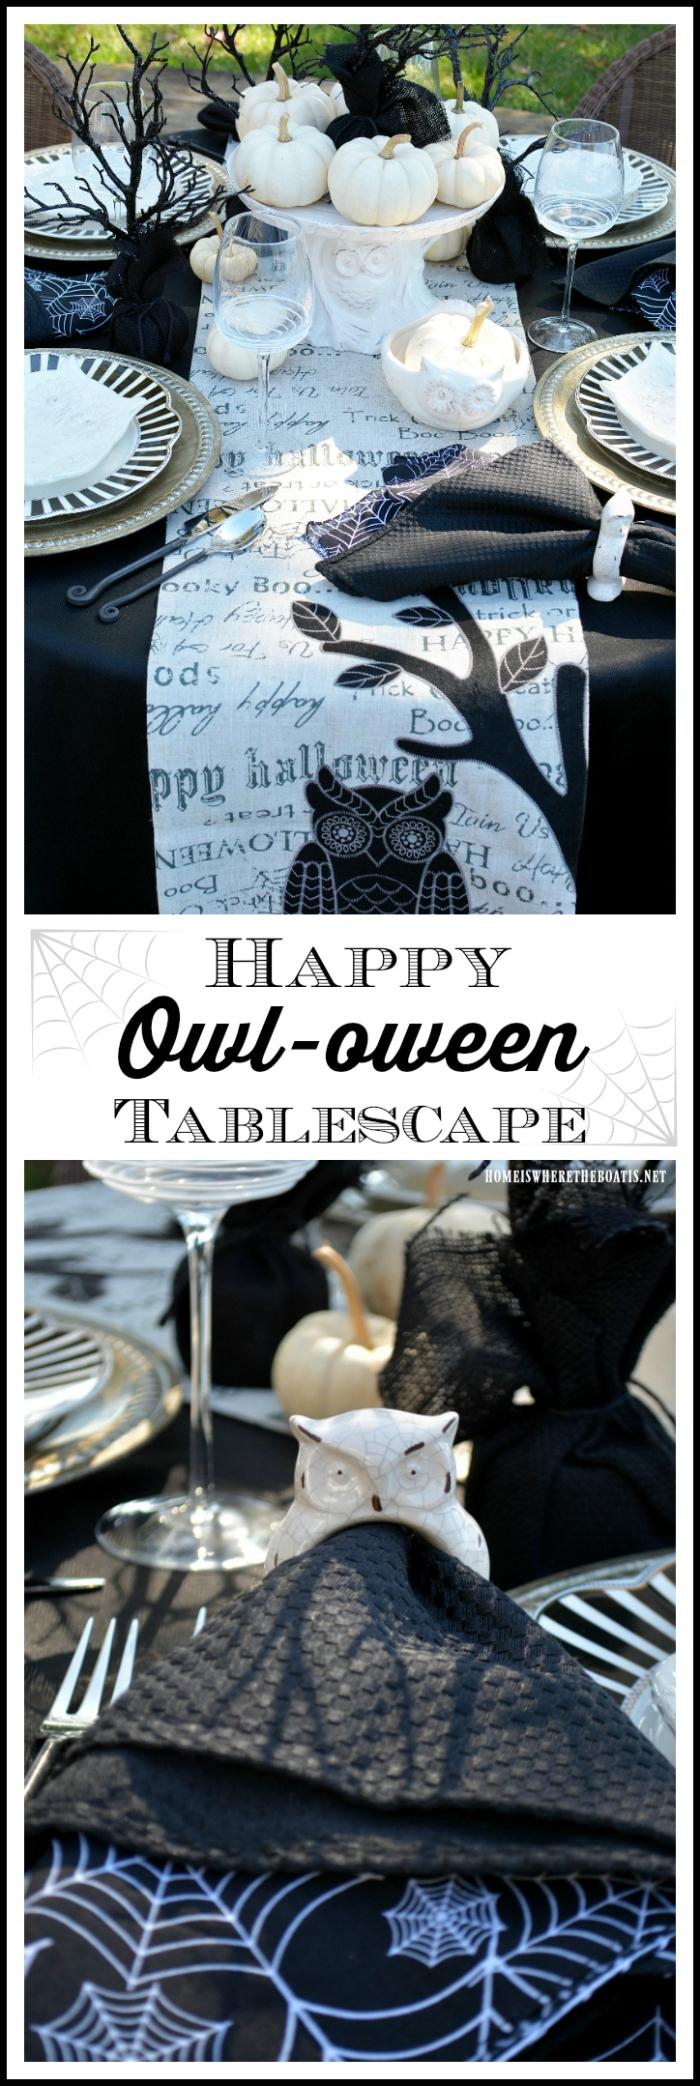 happy-owl-oween-table